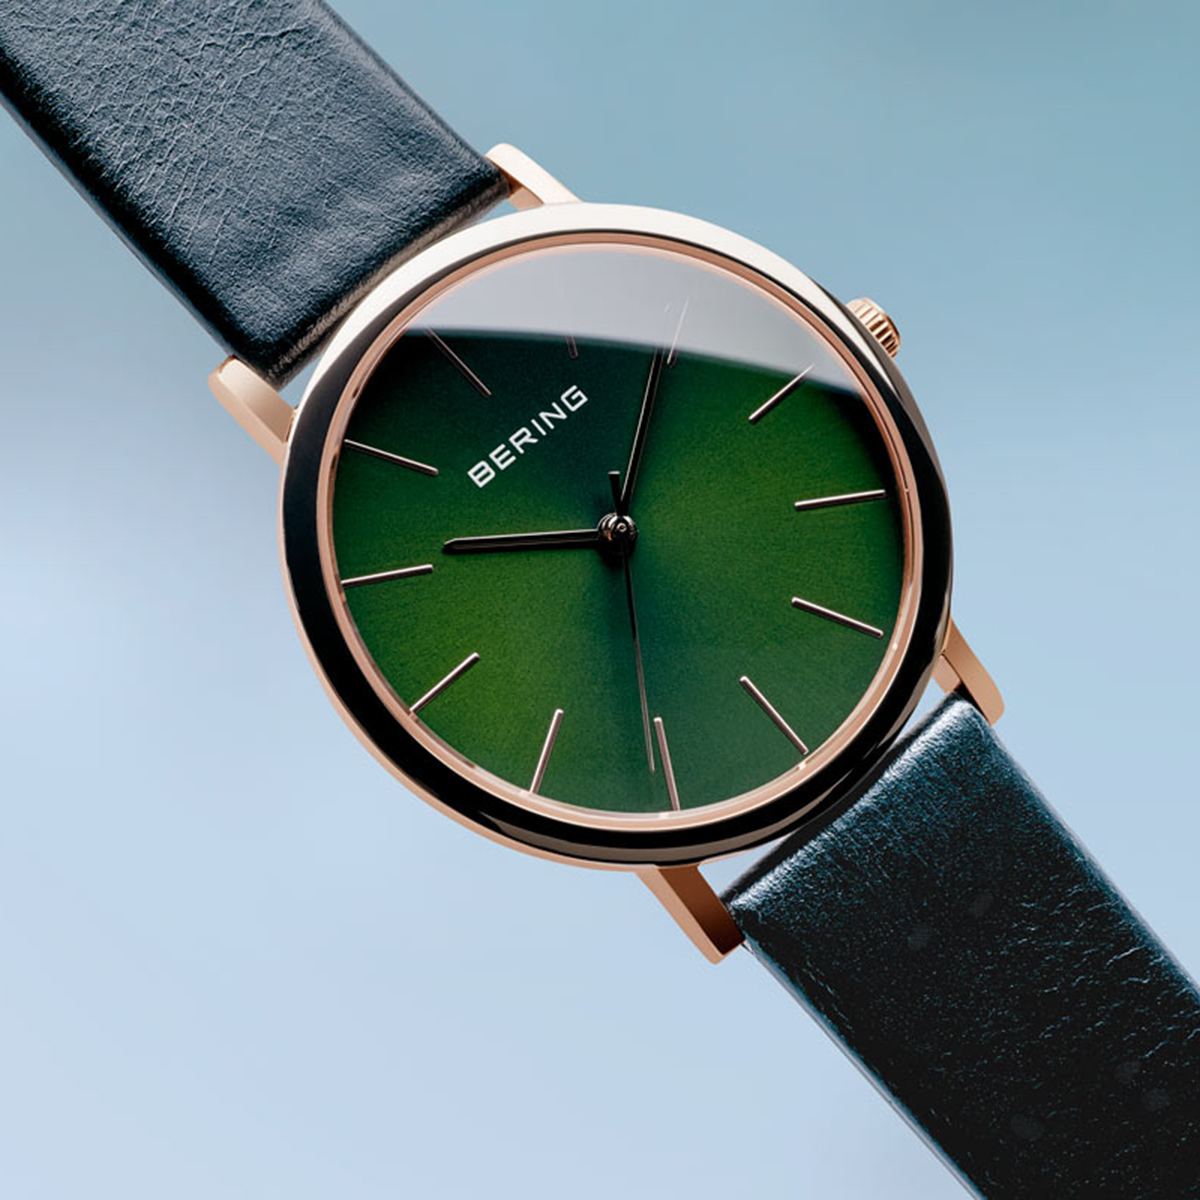 Zegarek damski Bering classic 13436-469 - duże 1